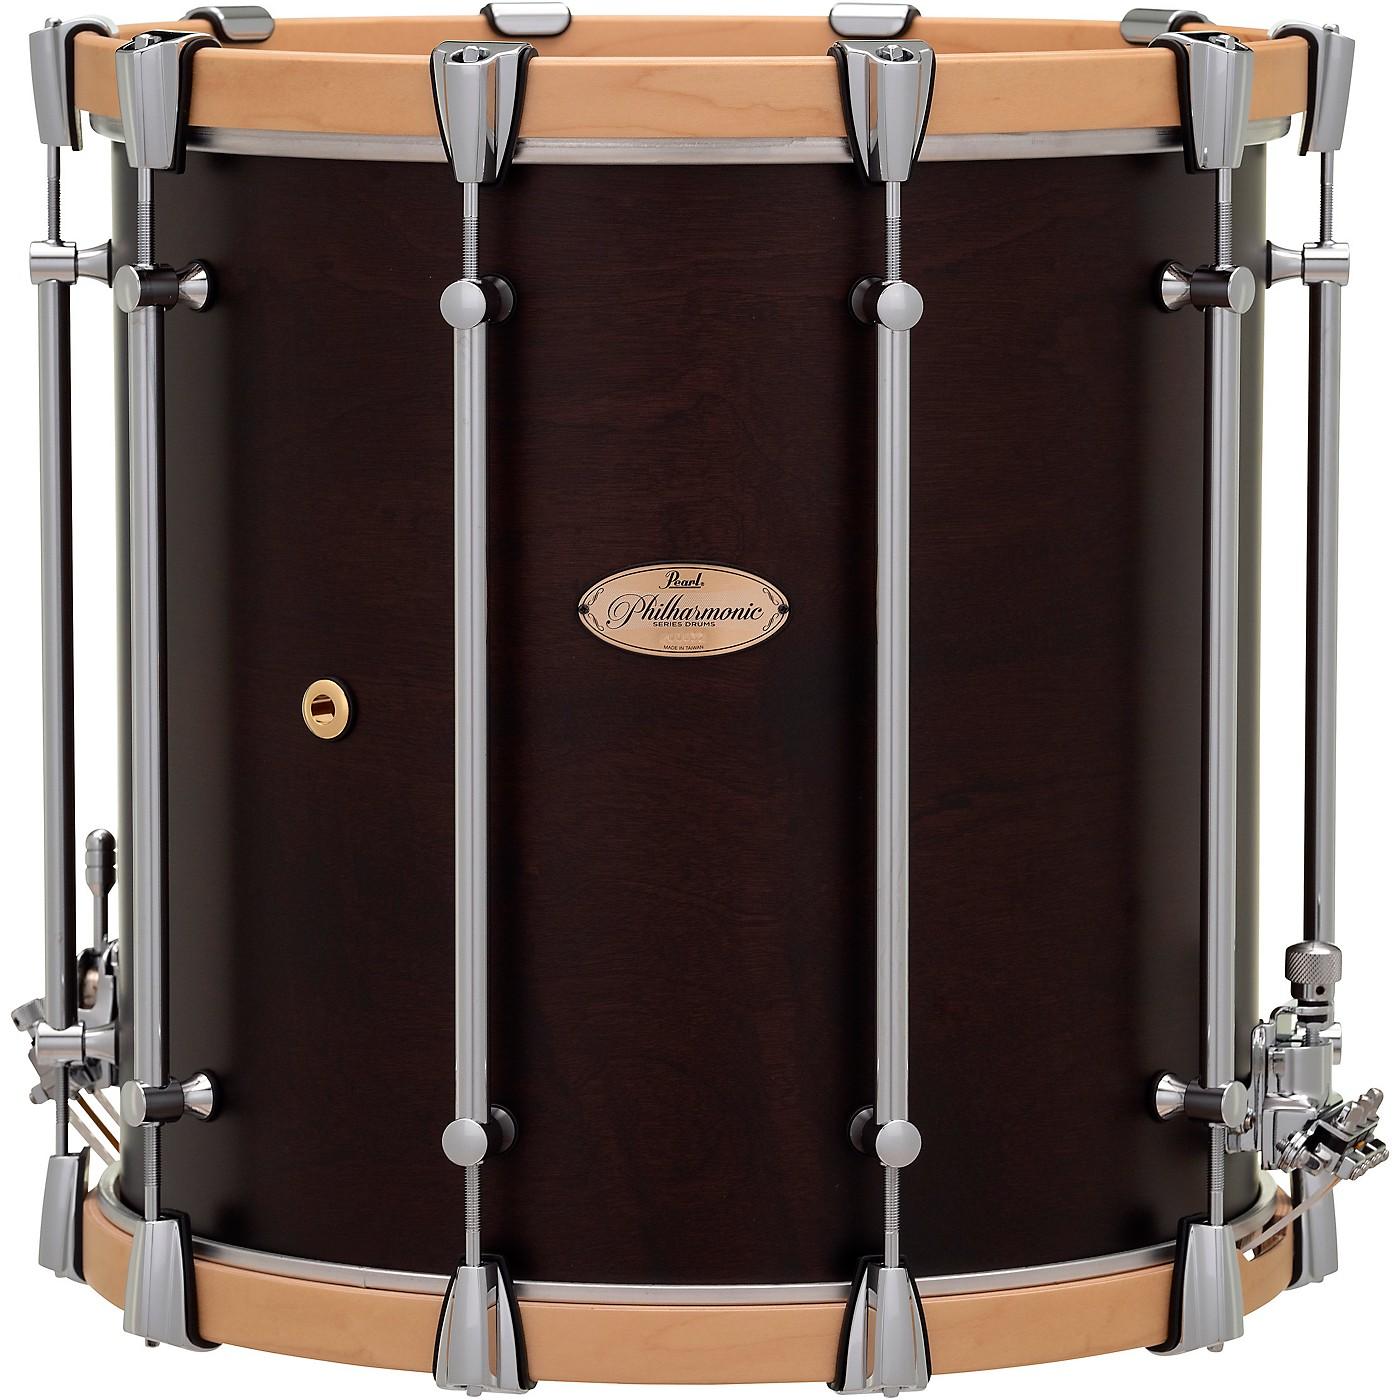 Pearl Philharmonic African Mahogany Snare Drum thumbnail